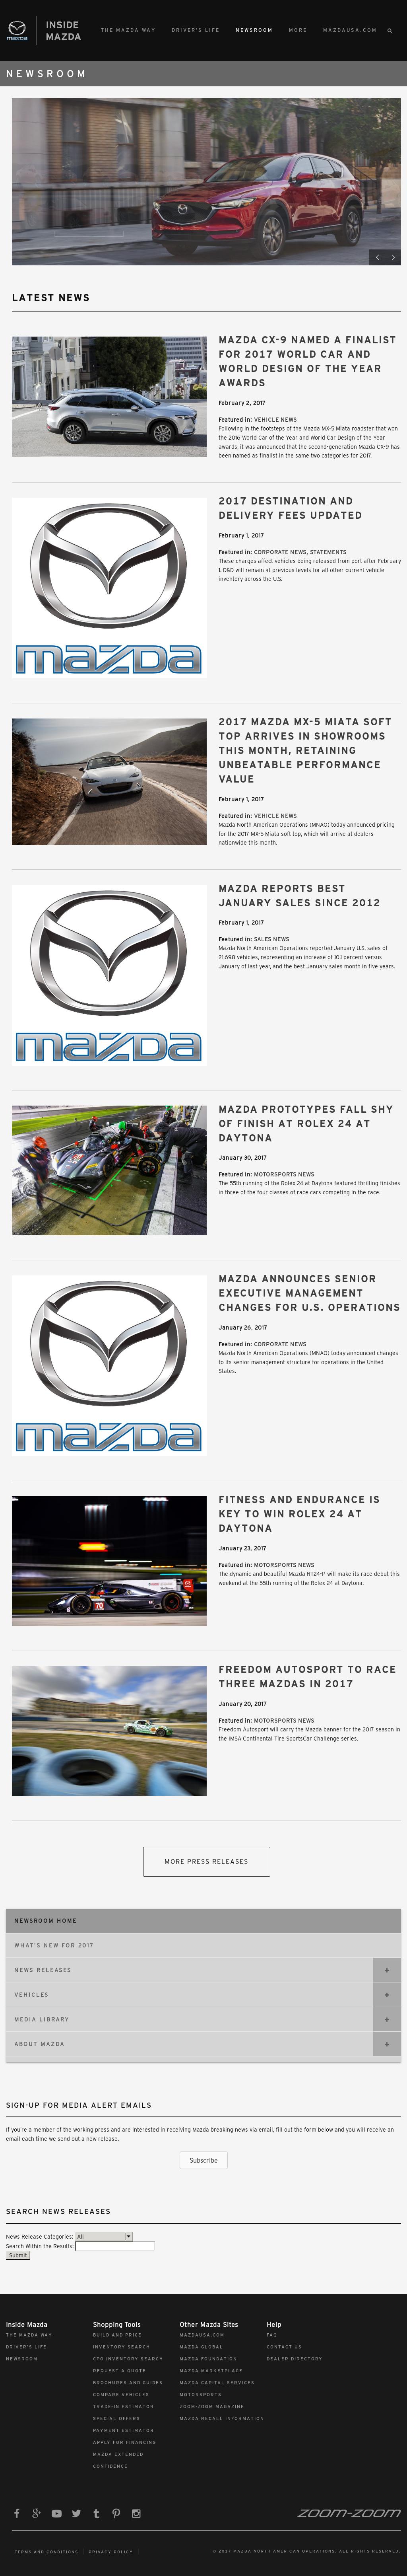 mazda pinterest temecula and atenza cars pin